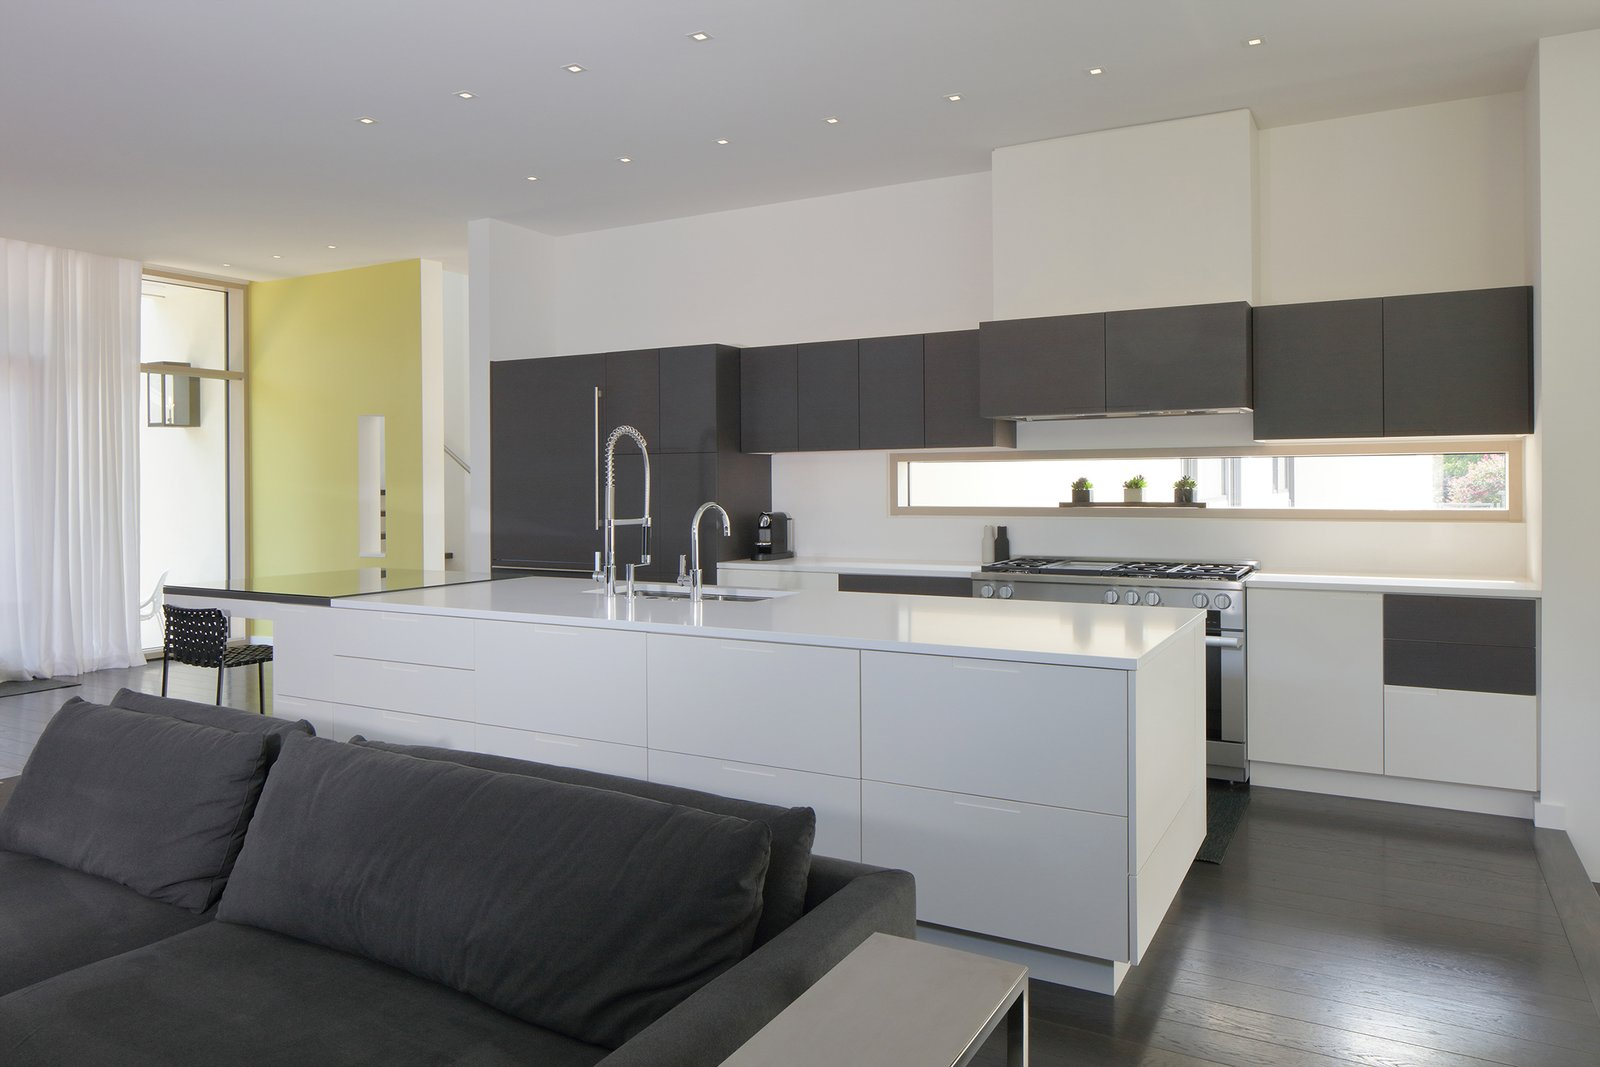 Kitchen, Engineered Quartz Counter, White Cabinet, Wood Cabinet, Dark Hardwood Floor, Ceiling Lighting, Range, Refrigerator, and Undermount Sink Kitchen  The Hartley Pavliska House